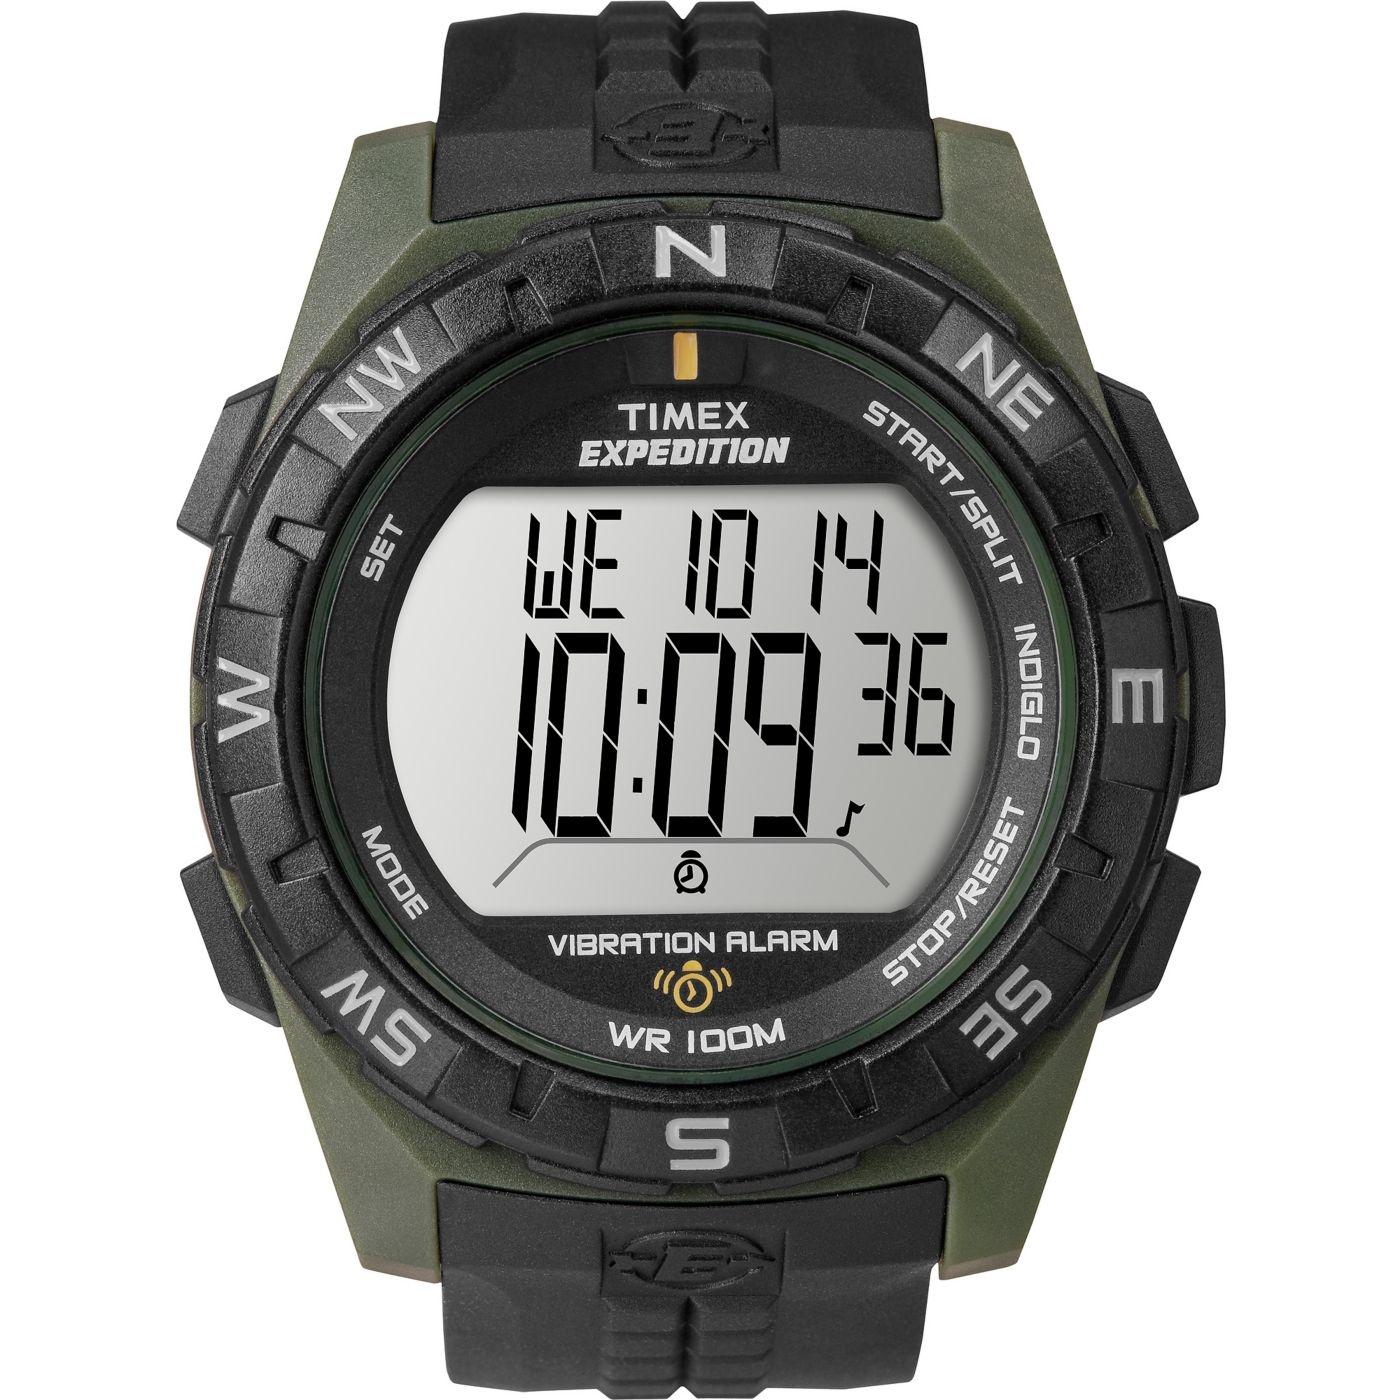 ecff8c58b Timex Men's Expedition Rugged Digital Compass Watch, Black Resin ...